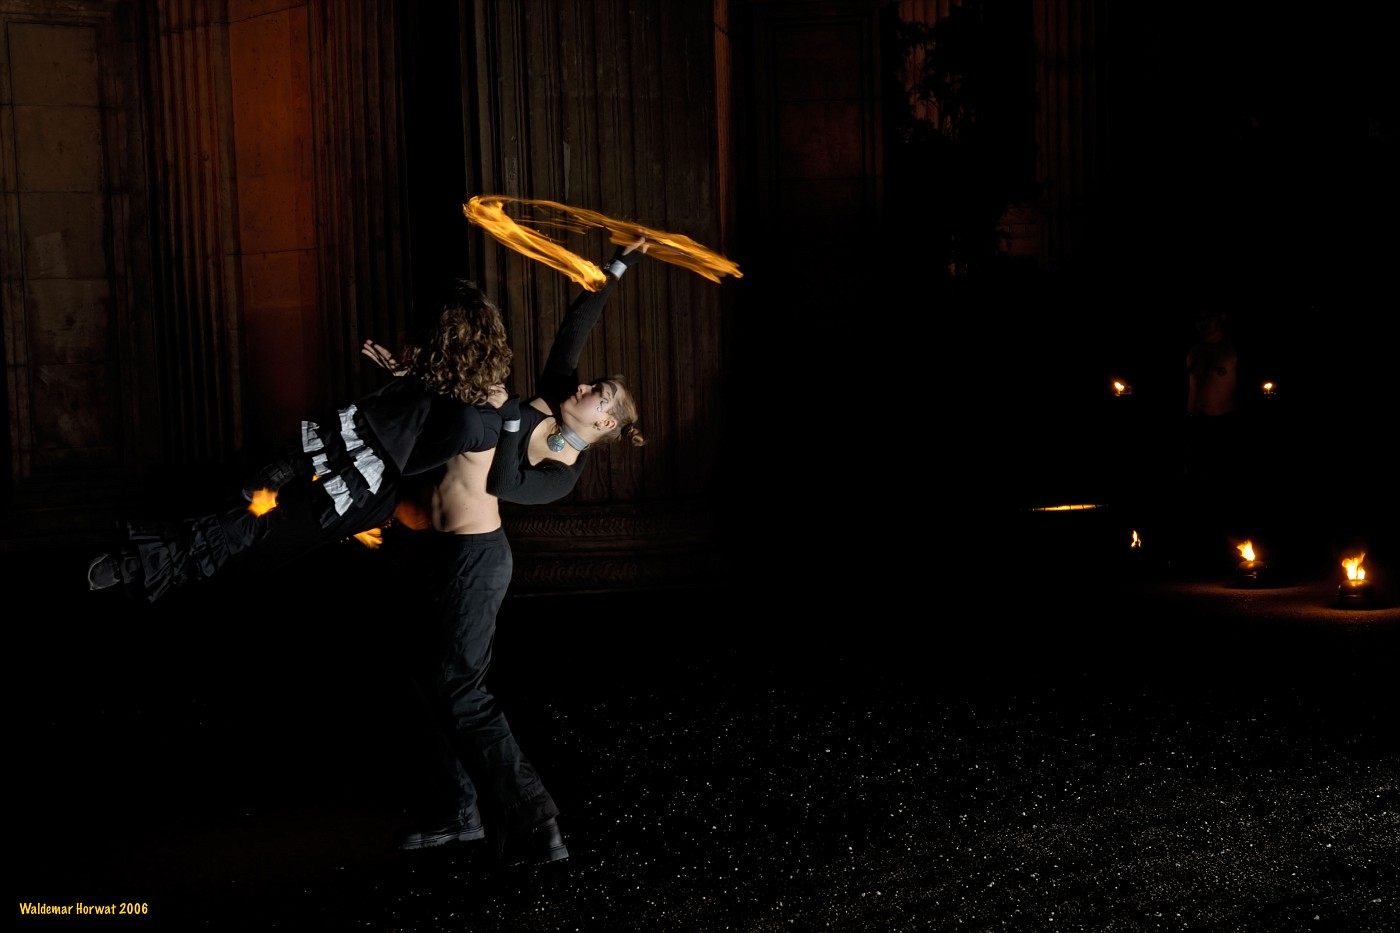 Ian Carrying Katy